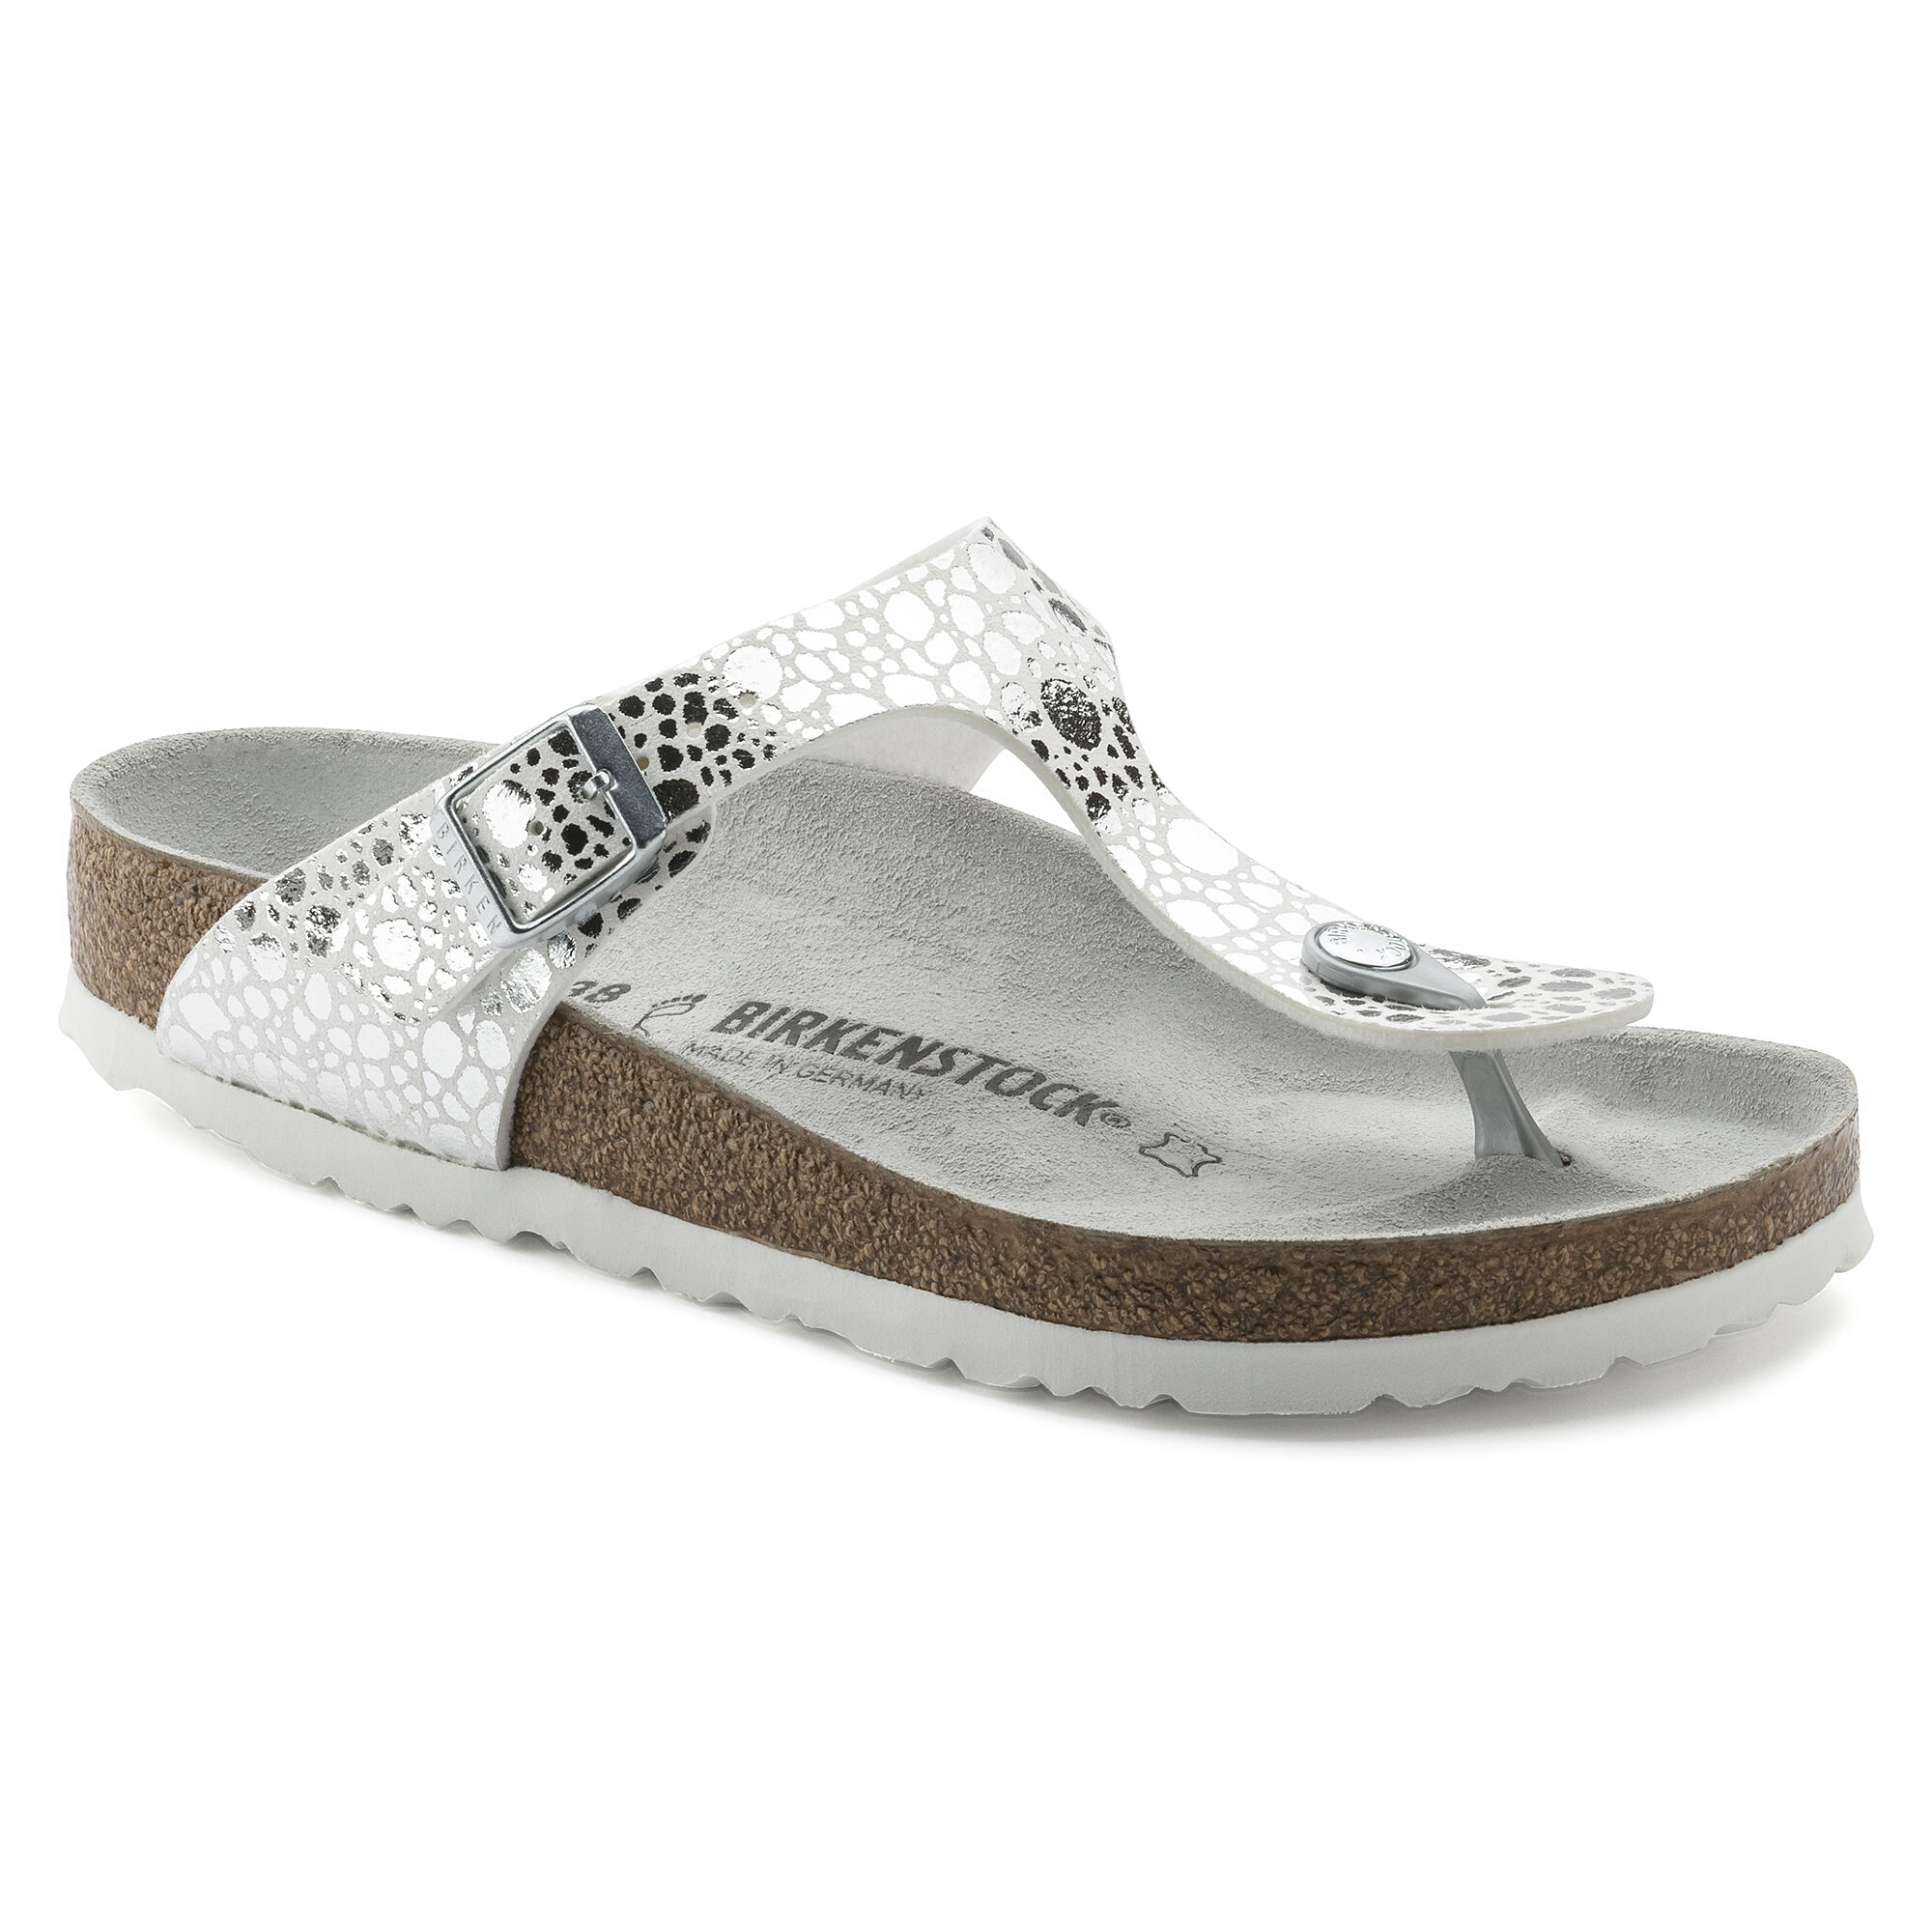 Birkenstock GIZEH - T-bar sandals - metallic stones/silver/gray QGU22